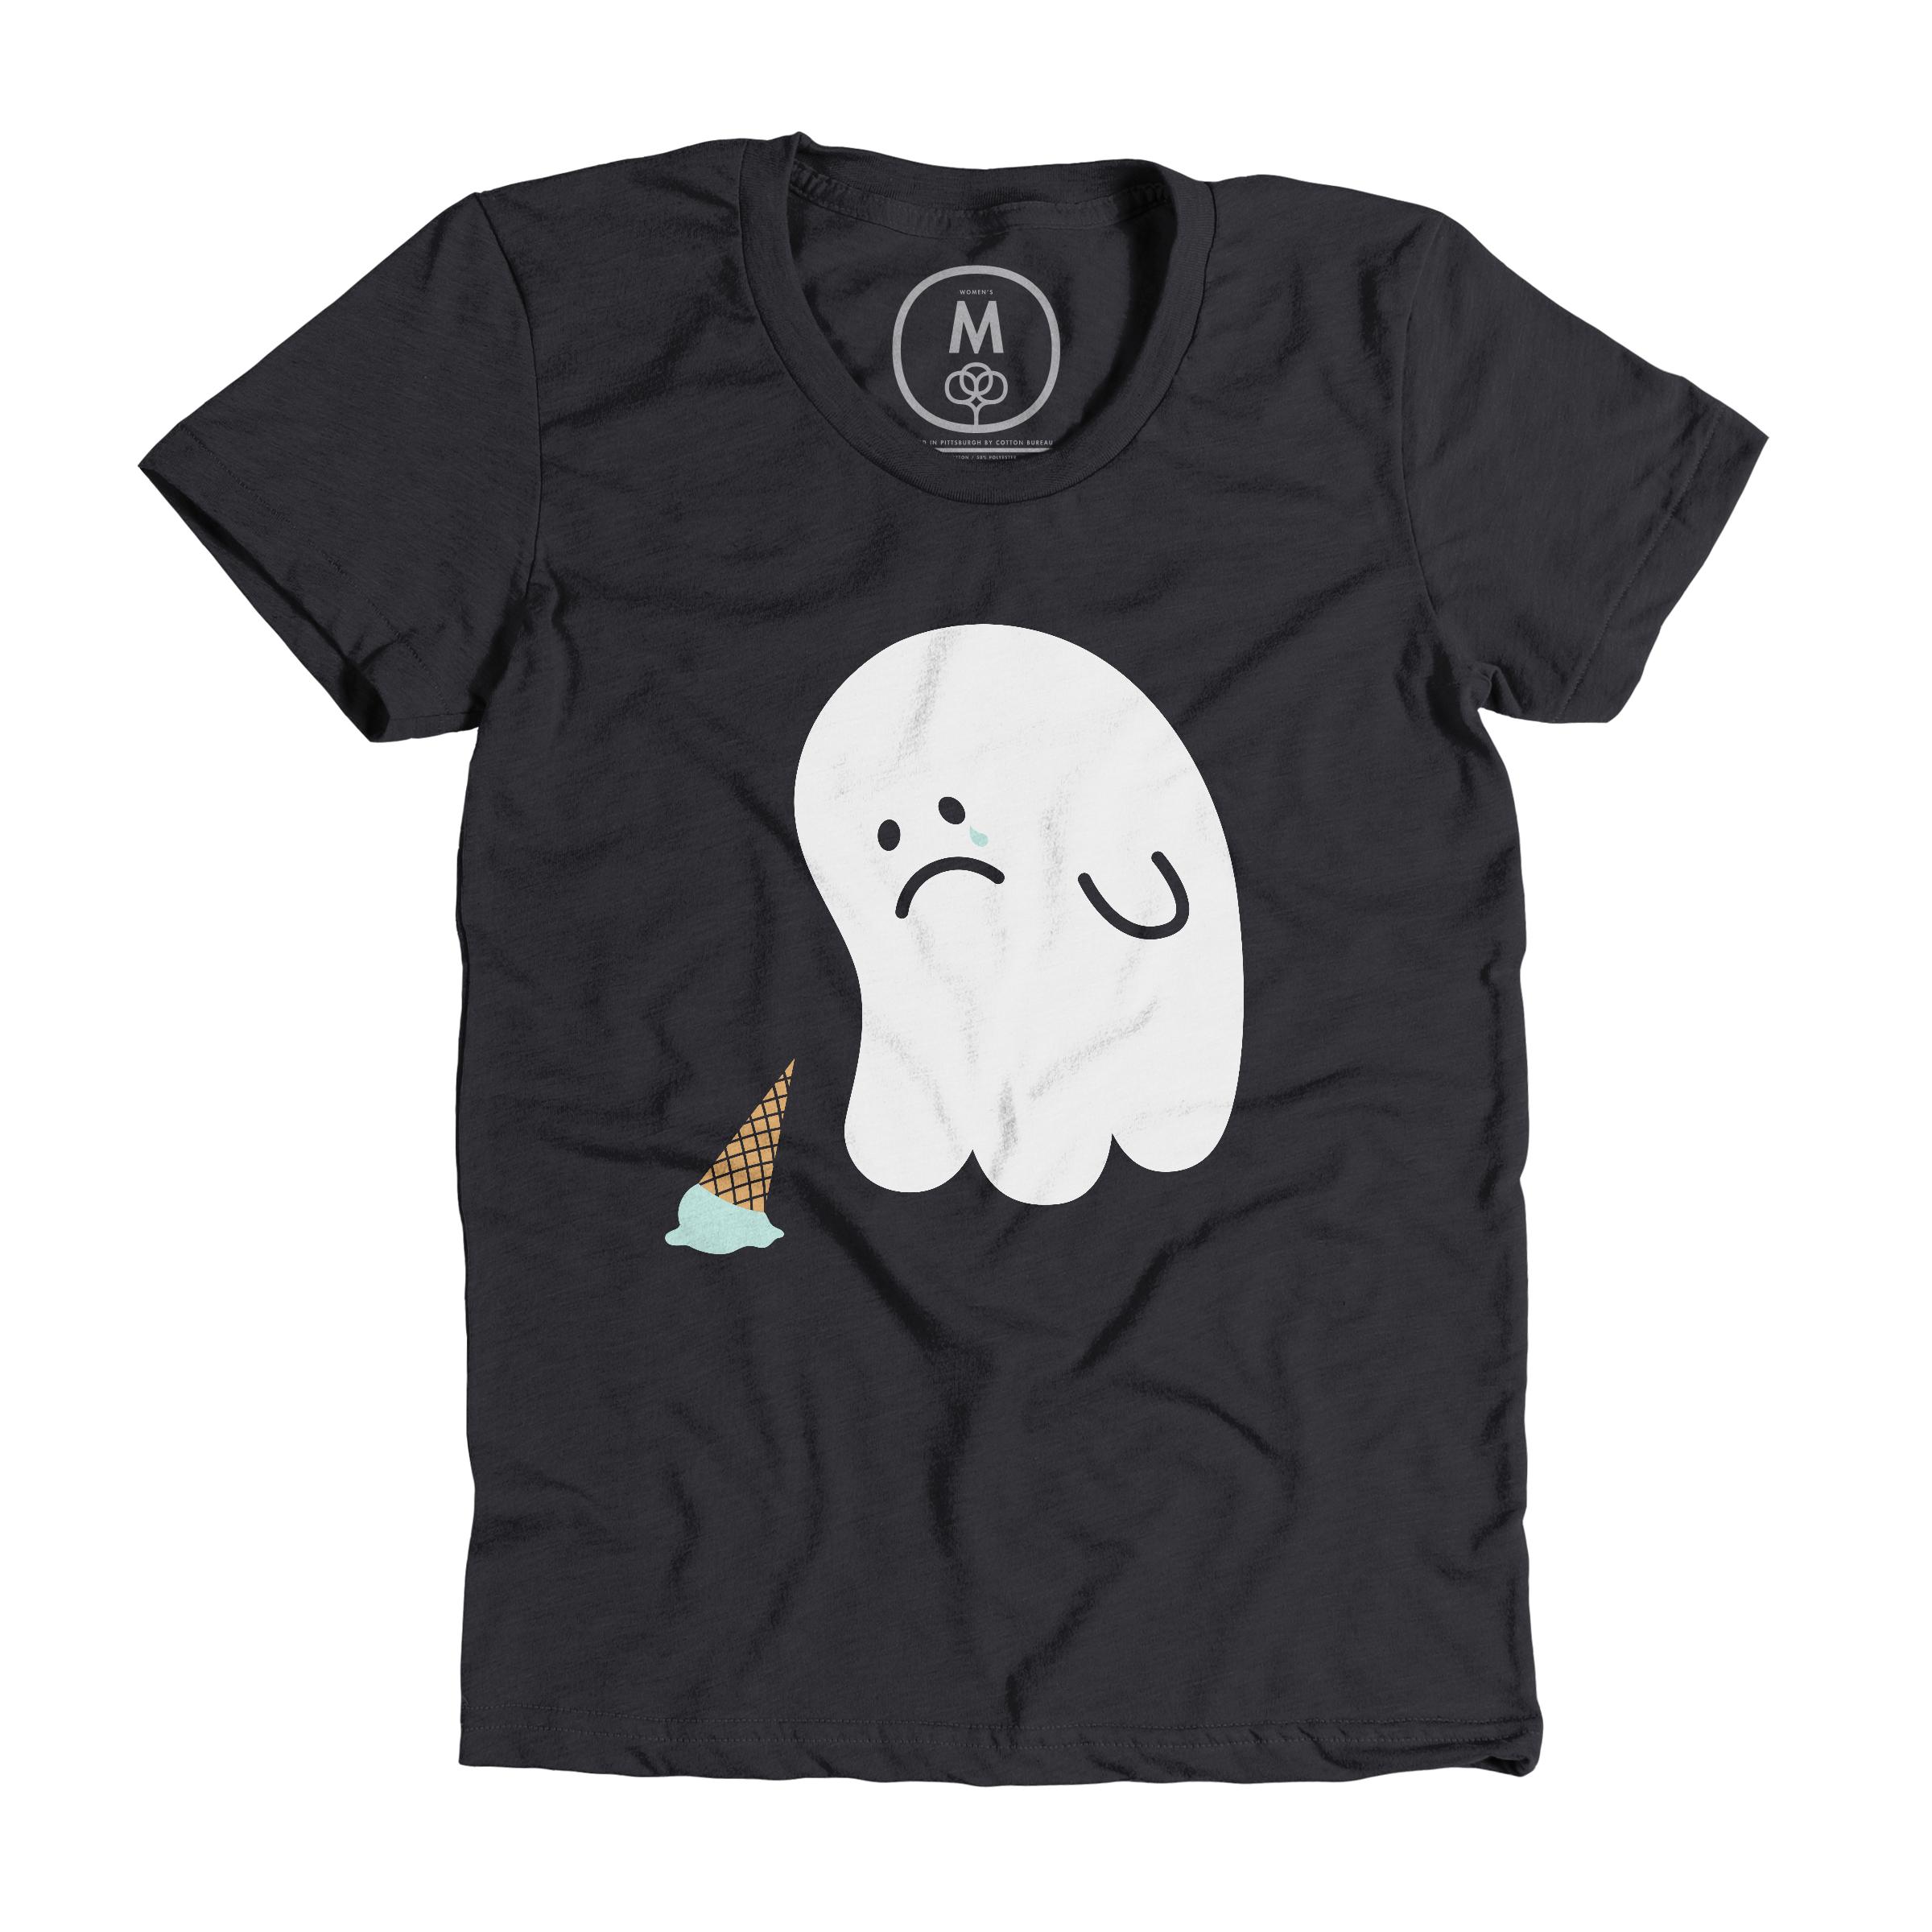 Sad Ghost Charcoal (Women's)